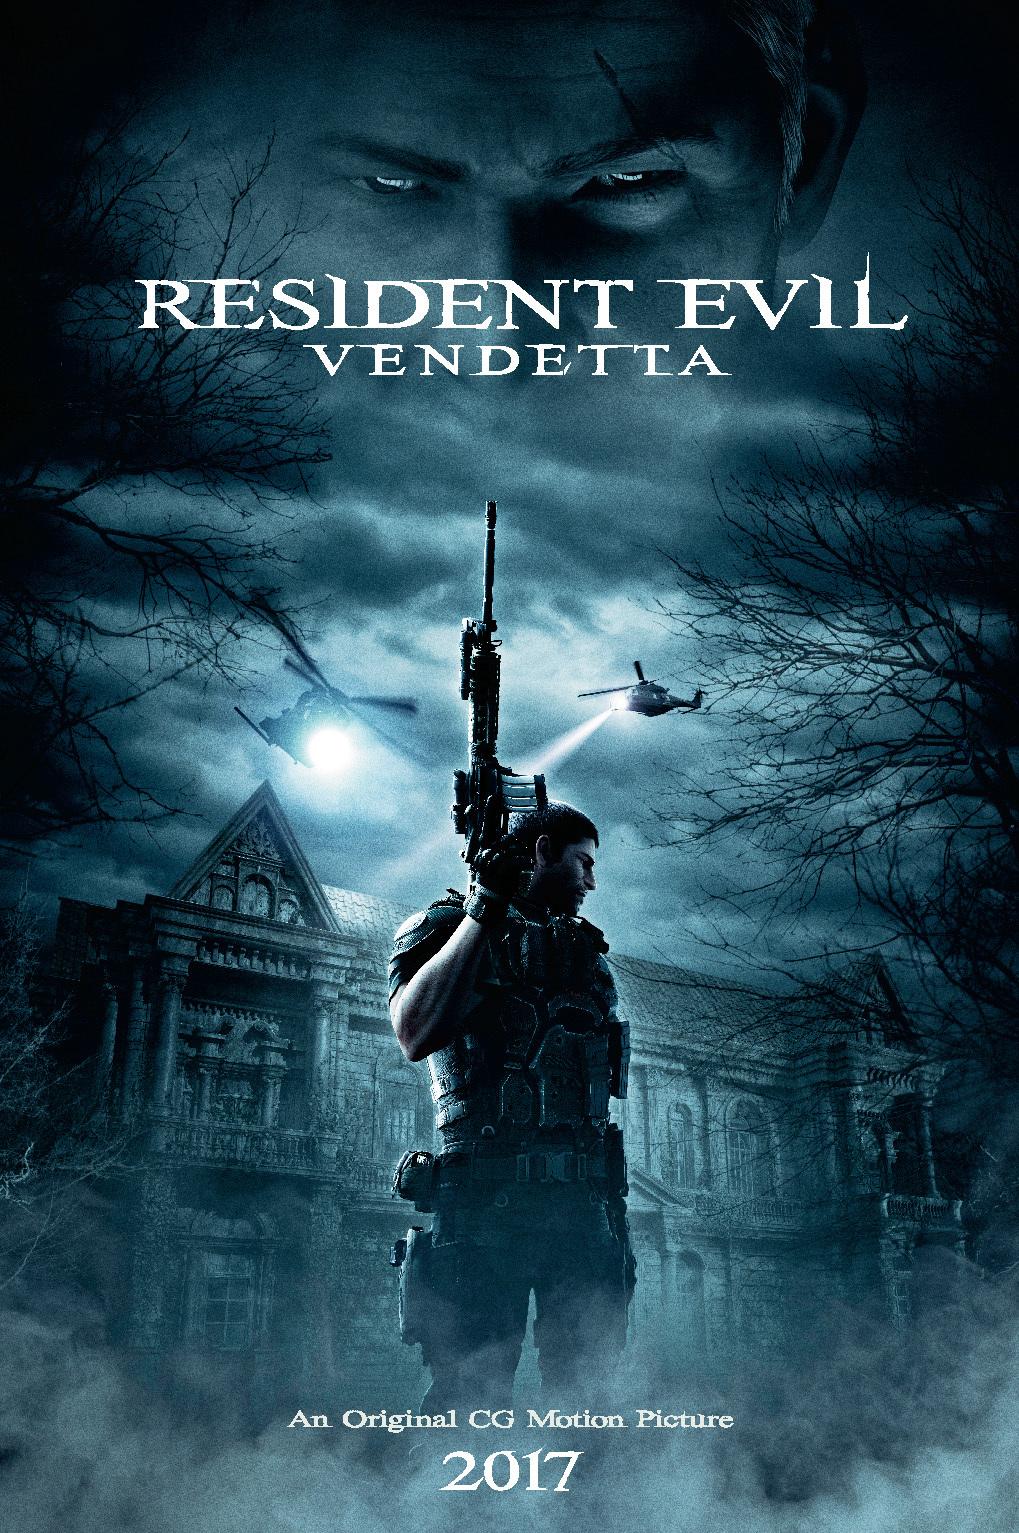 Resident Evil Vendetta Animasyon Filmi Türkçe Dublaj izle